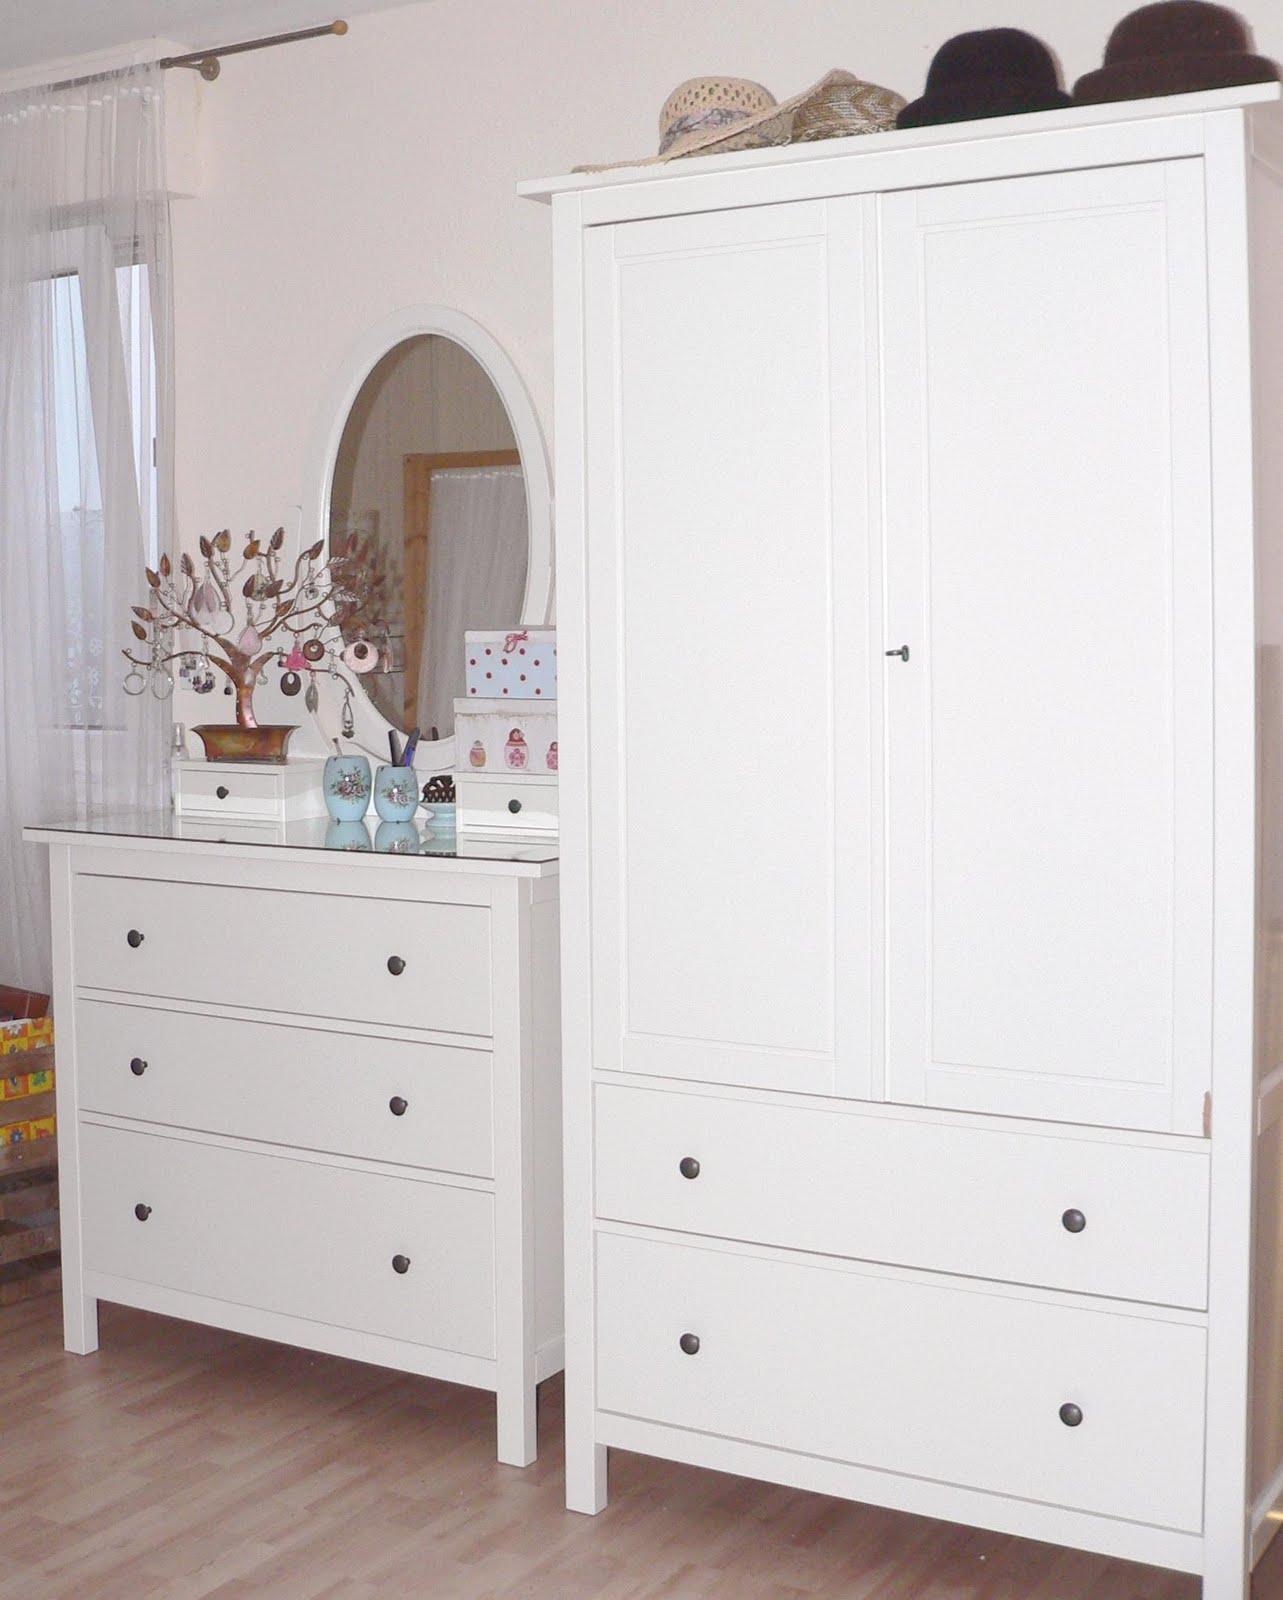 kleiner schrank ikea swalif. Black Bedroom Furniture Sets. Home Design Ideas